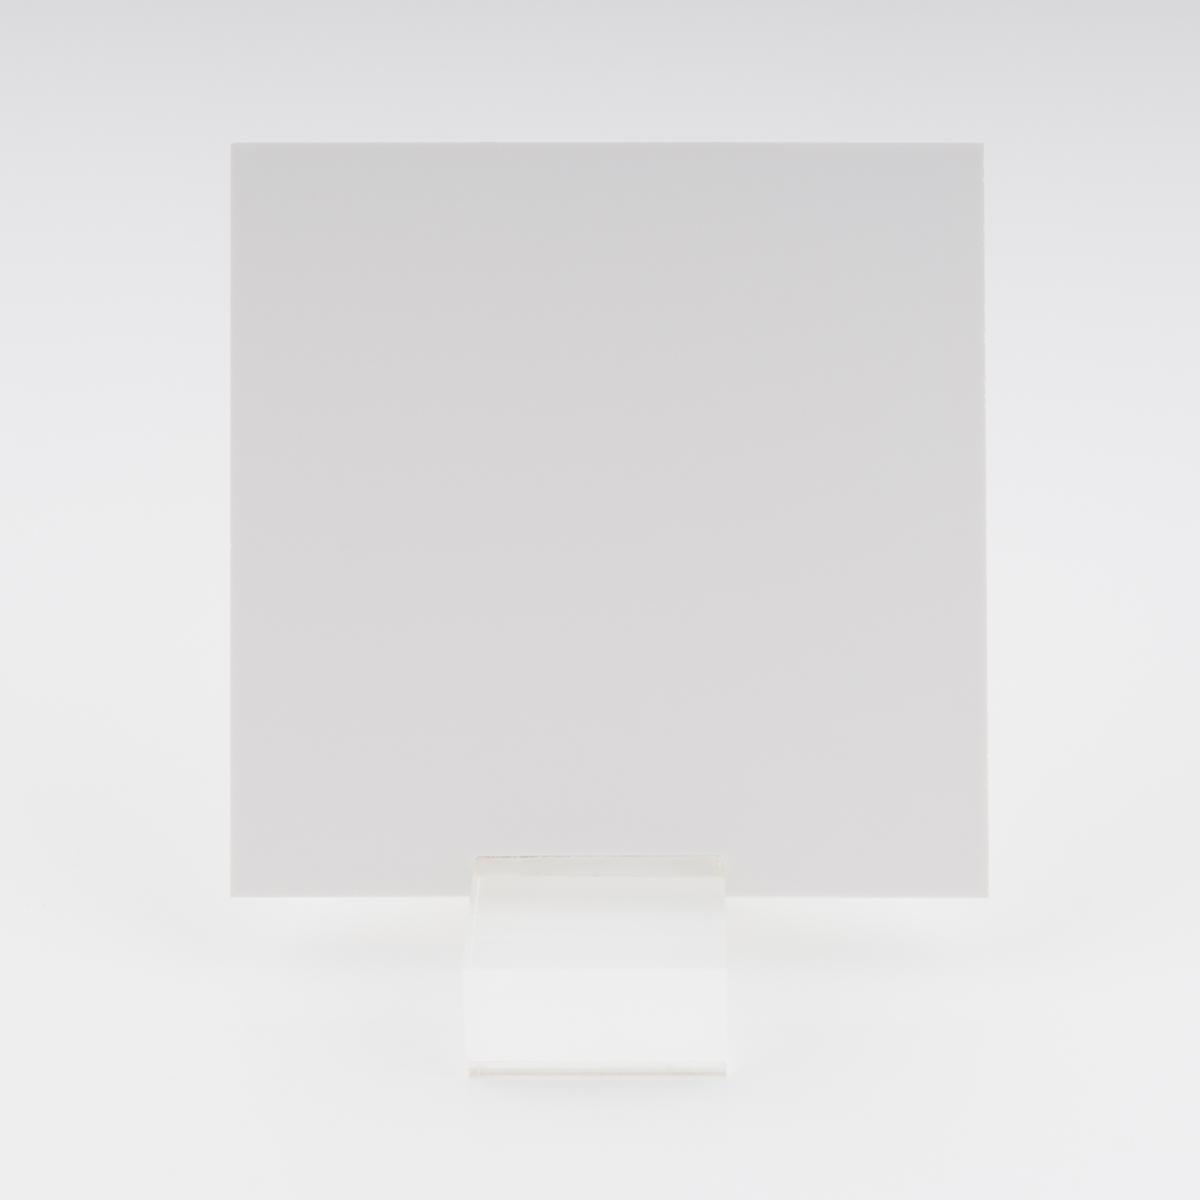 White Gloss Palight Foamed Pvc Sheet